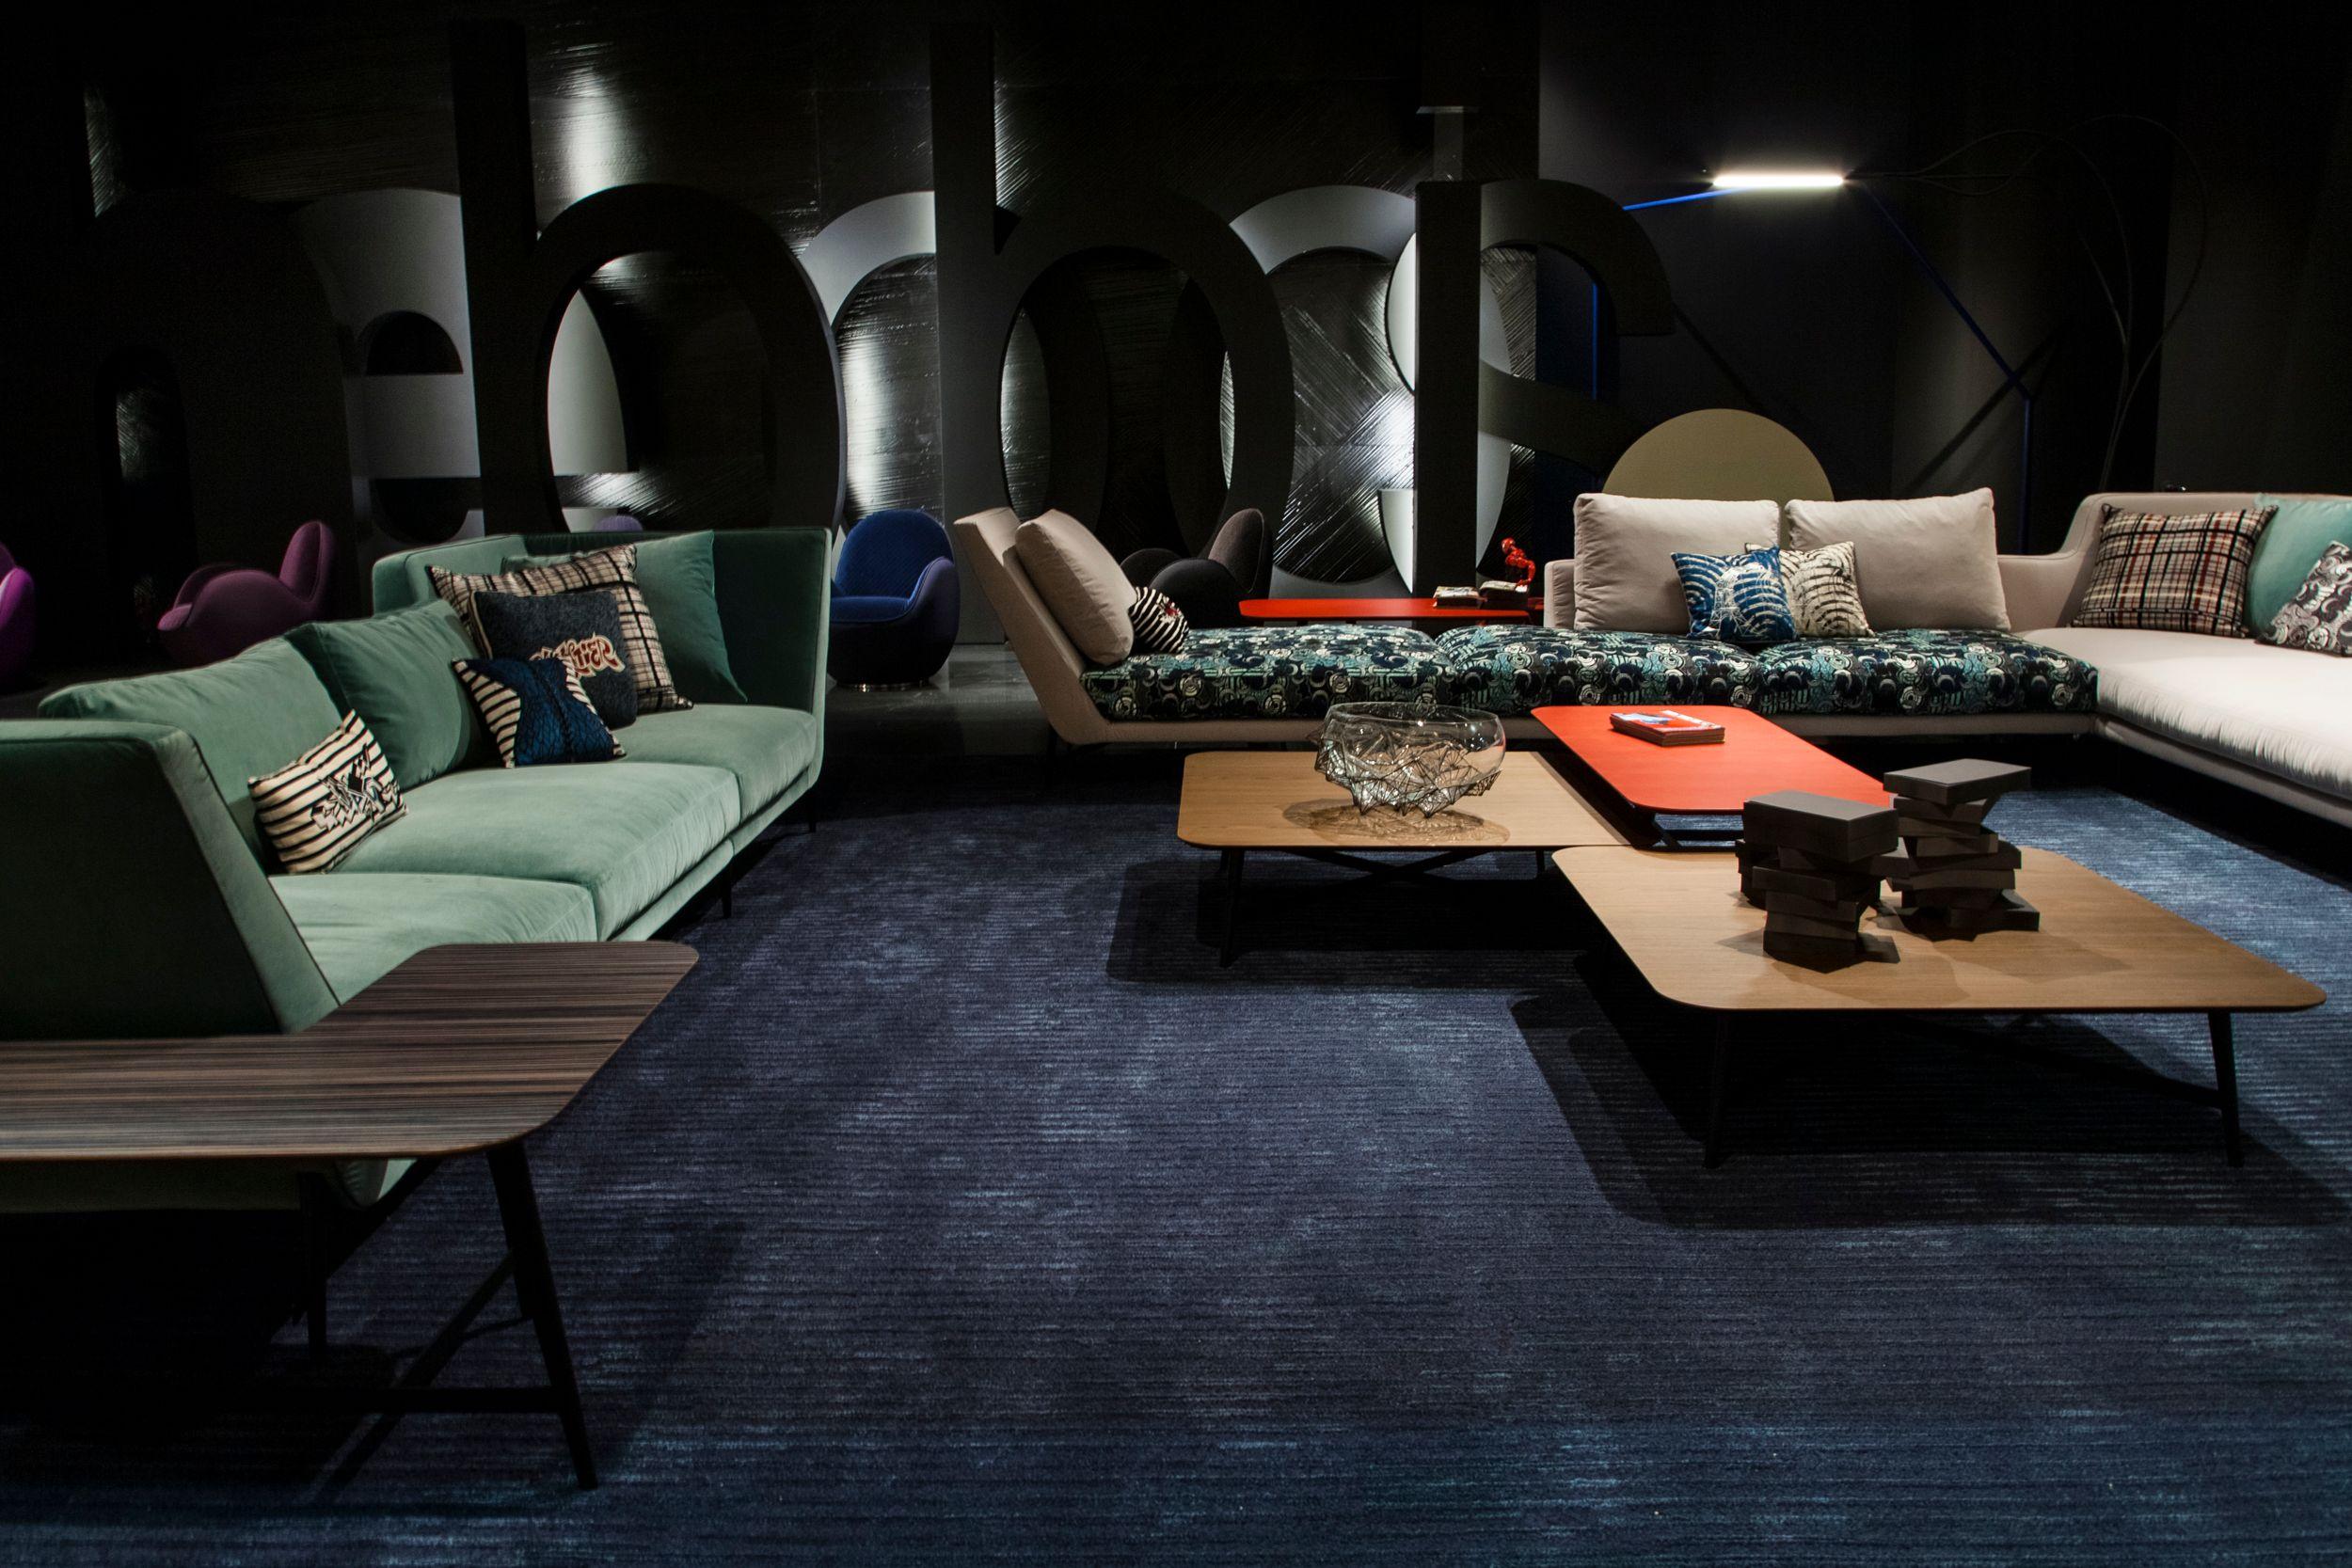 modular fabric sofa atmos by roche bobois design maurizio. Black Bedroom Furniture Sets. Home Design Ideas